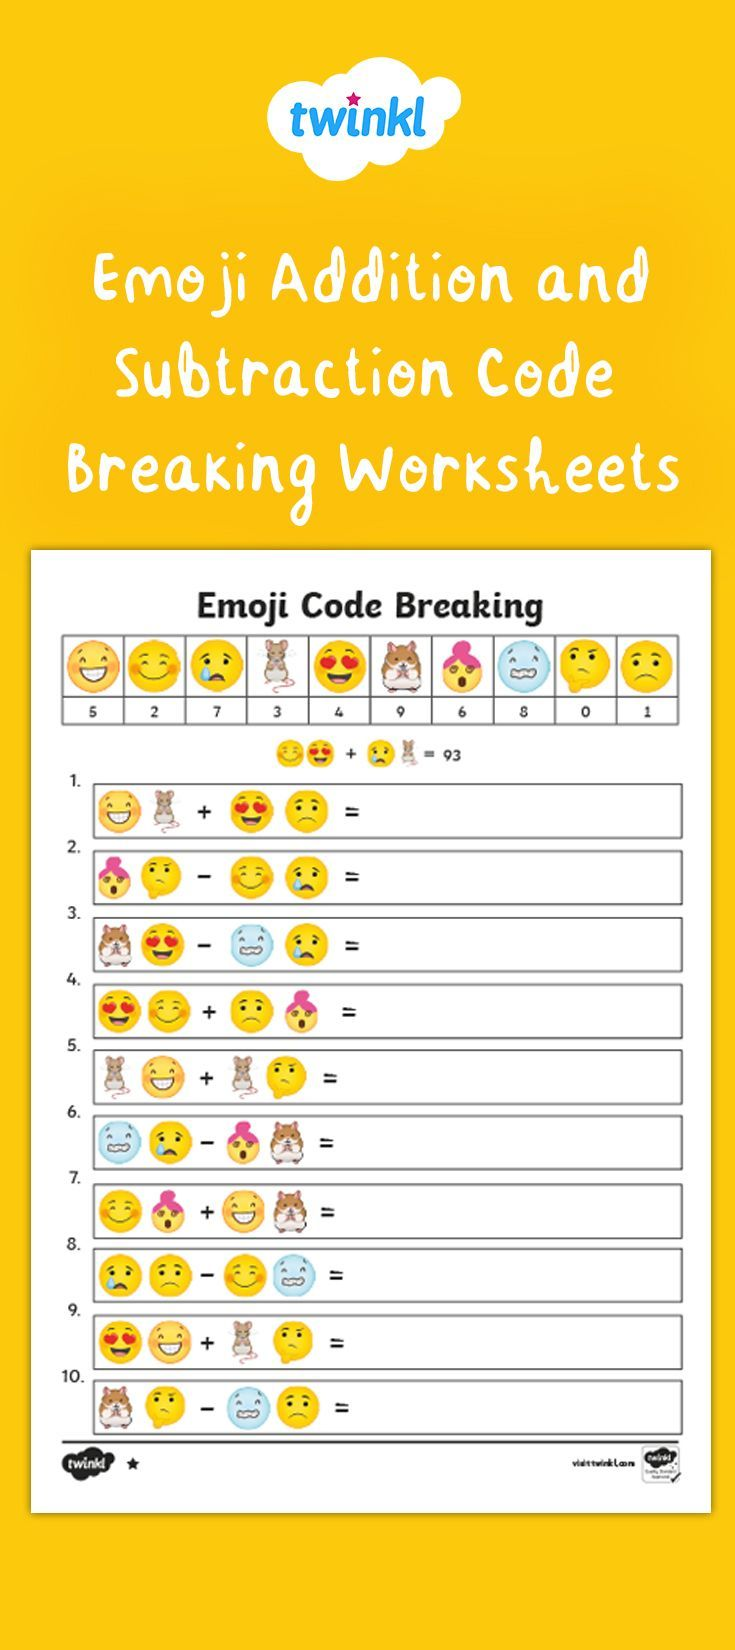 Emoji Maths Code Breaking Worksheets Ks2 Emoji Math Addition And Subtraction Emoji Codes [ 1650 x 735 Pixel ]